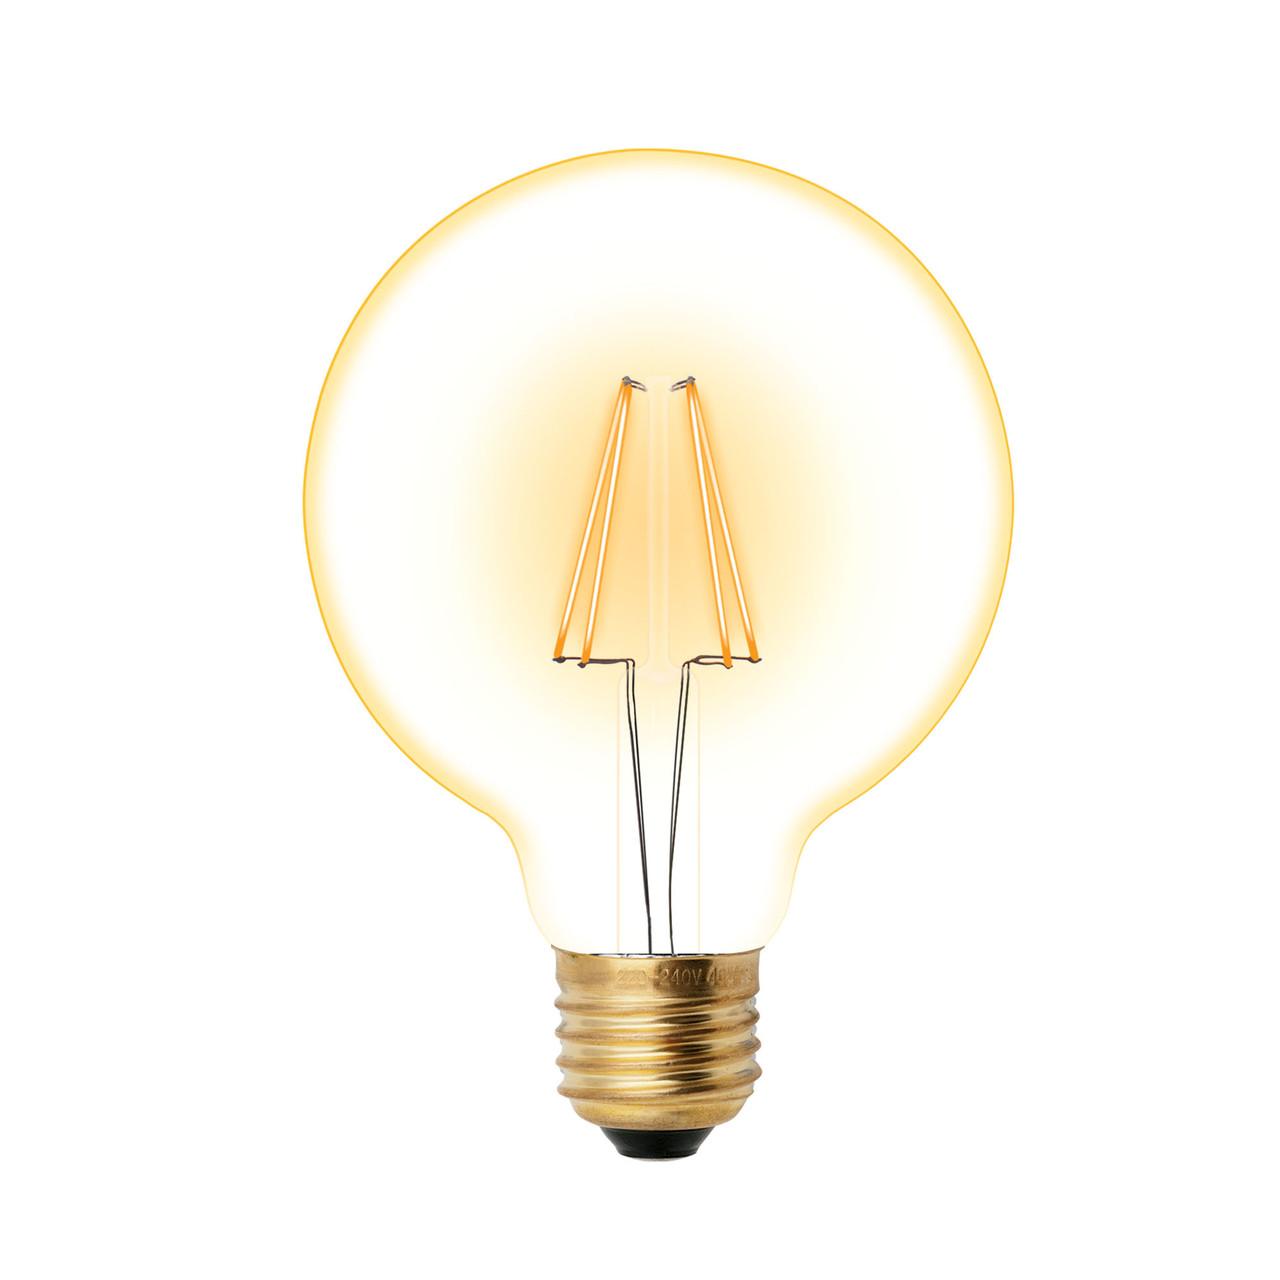 Лампа светодиодная VINTAGE LED-G95/4W/GOLDEN/E27 GLV21GO форма шар золот.колба